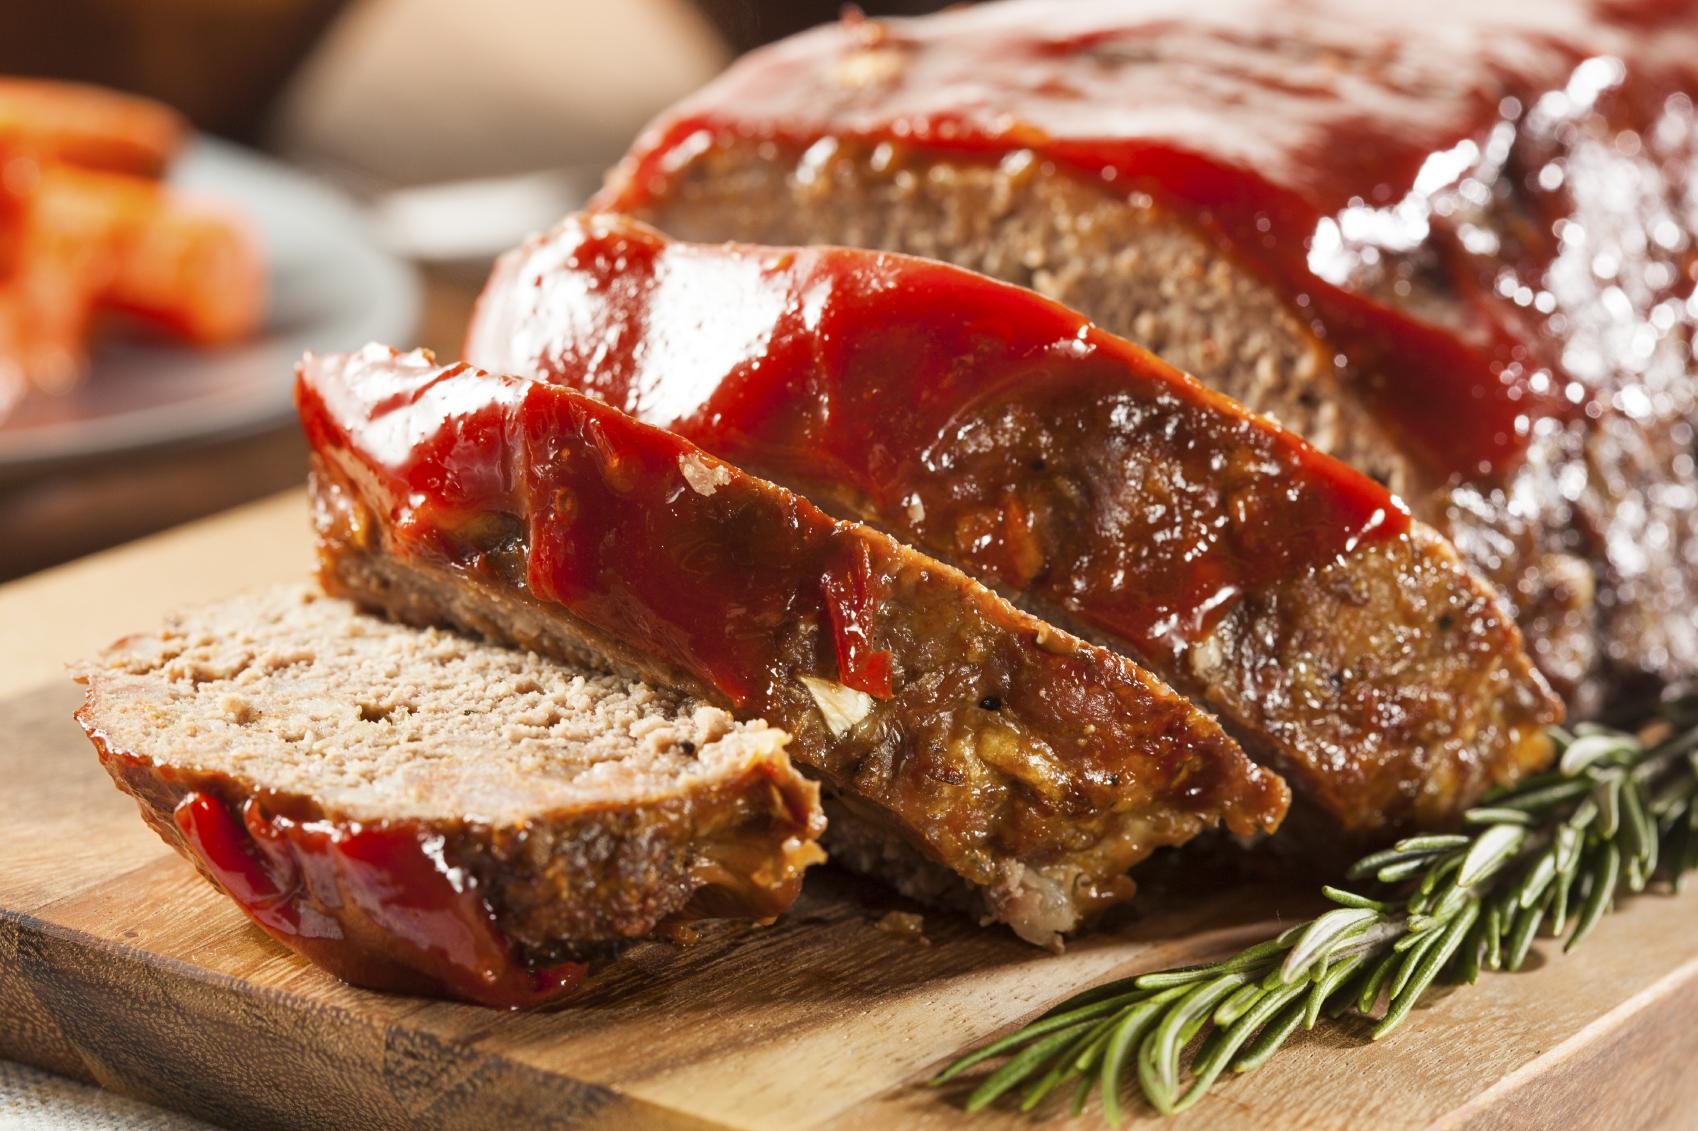 Seasoned meatloaf: Pulpettun imħawwar taċ-ċanga